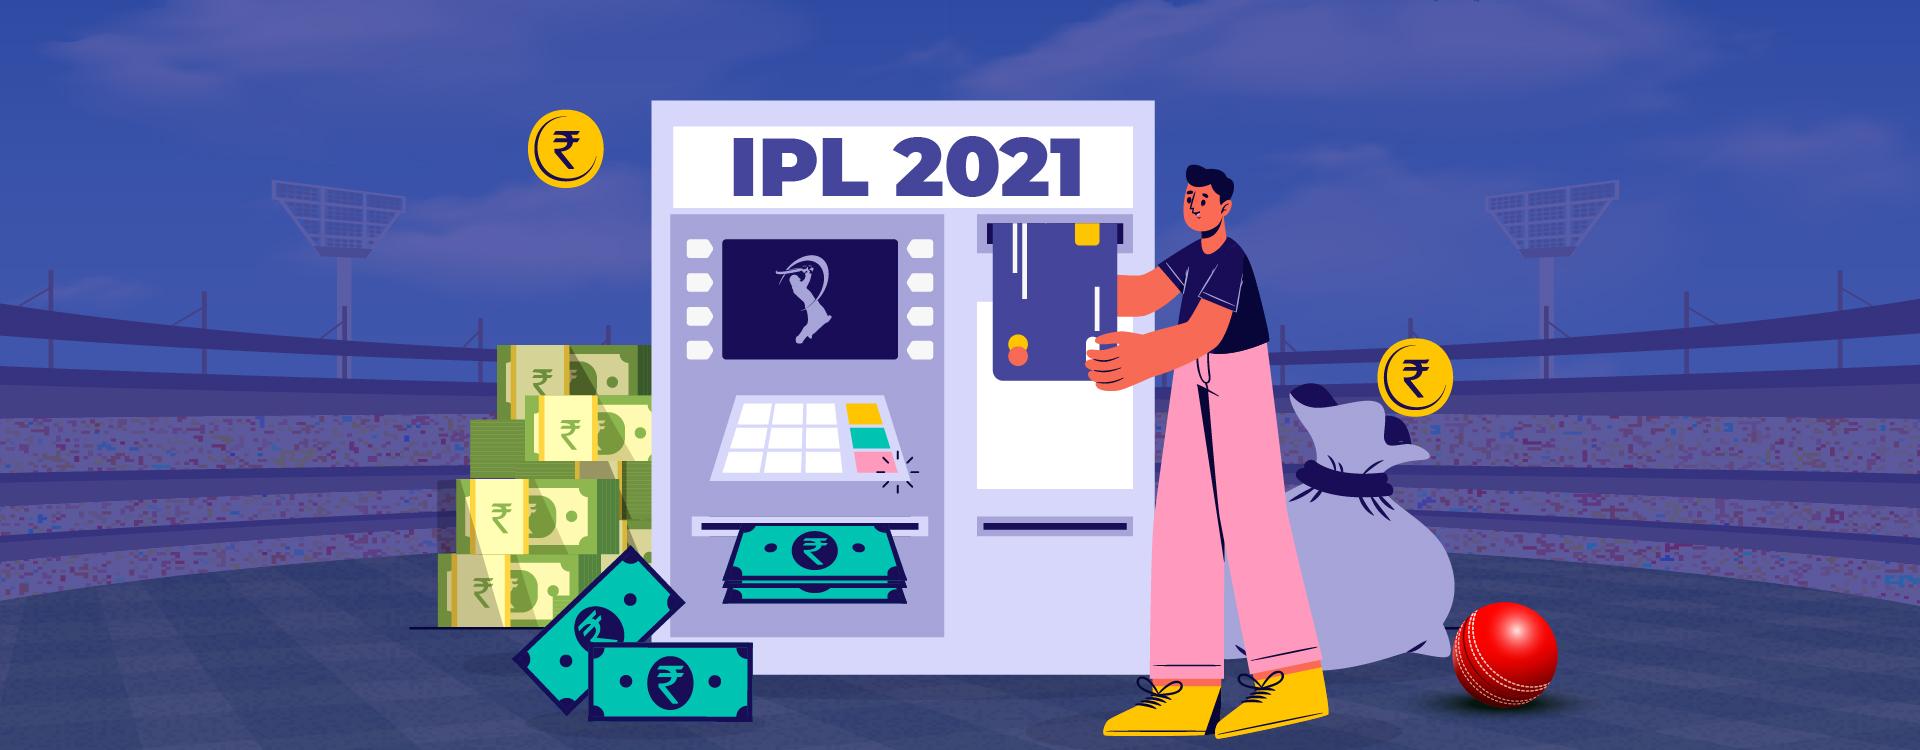 Analysing Viewership Revenue of IPL: How will 2021 fare?